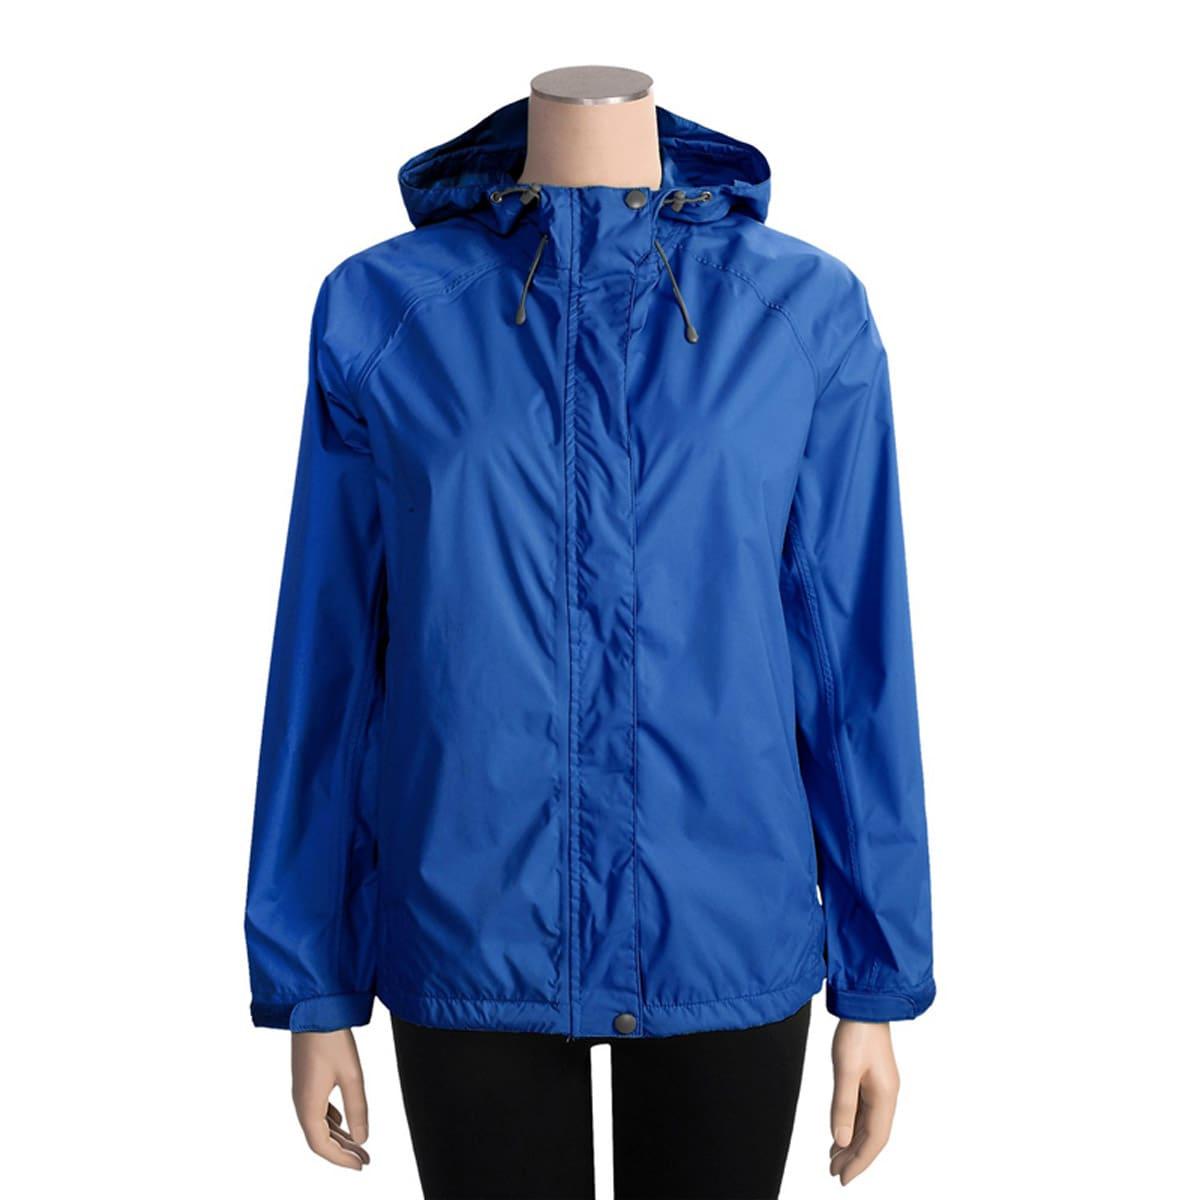 White Sierra Trabagon Shell Rain Jacket